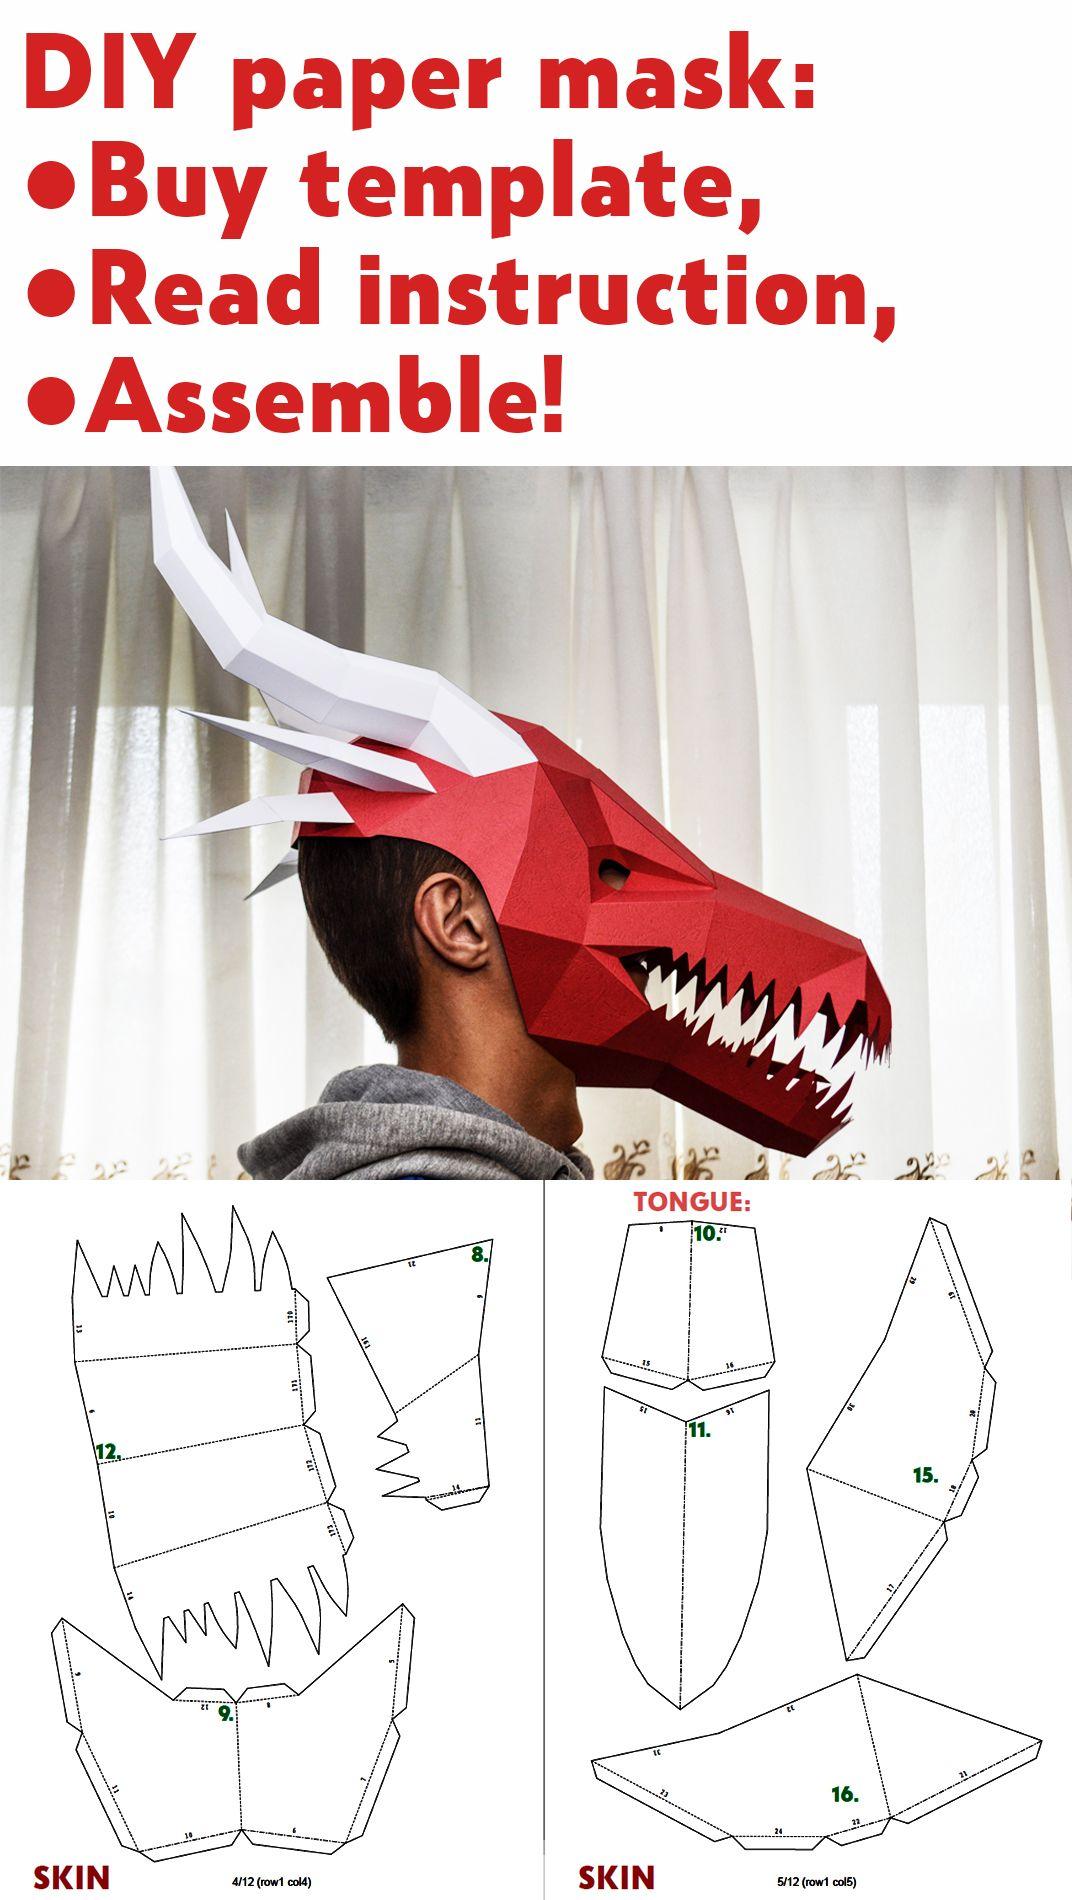 Papercraft Mask Dragon Diy Paper Craft Pdf Template Make